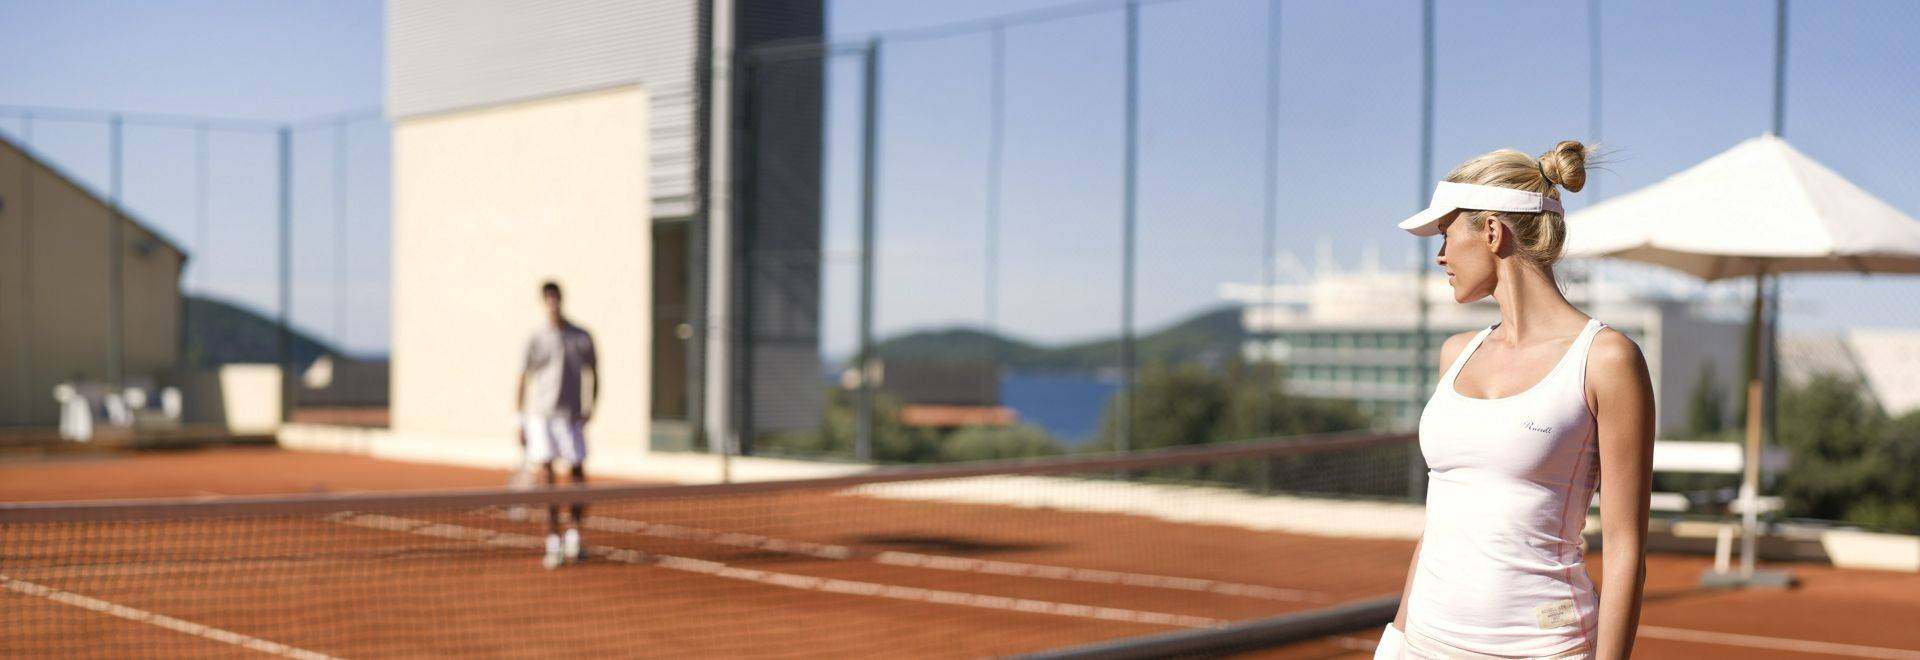 Sun-Gardens-tennis.jpg